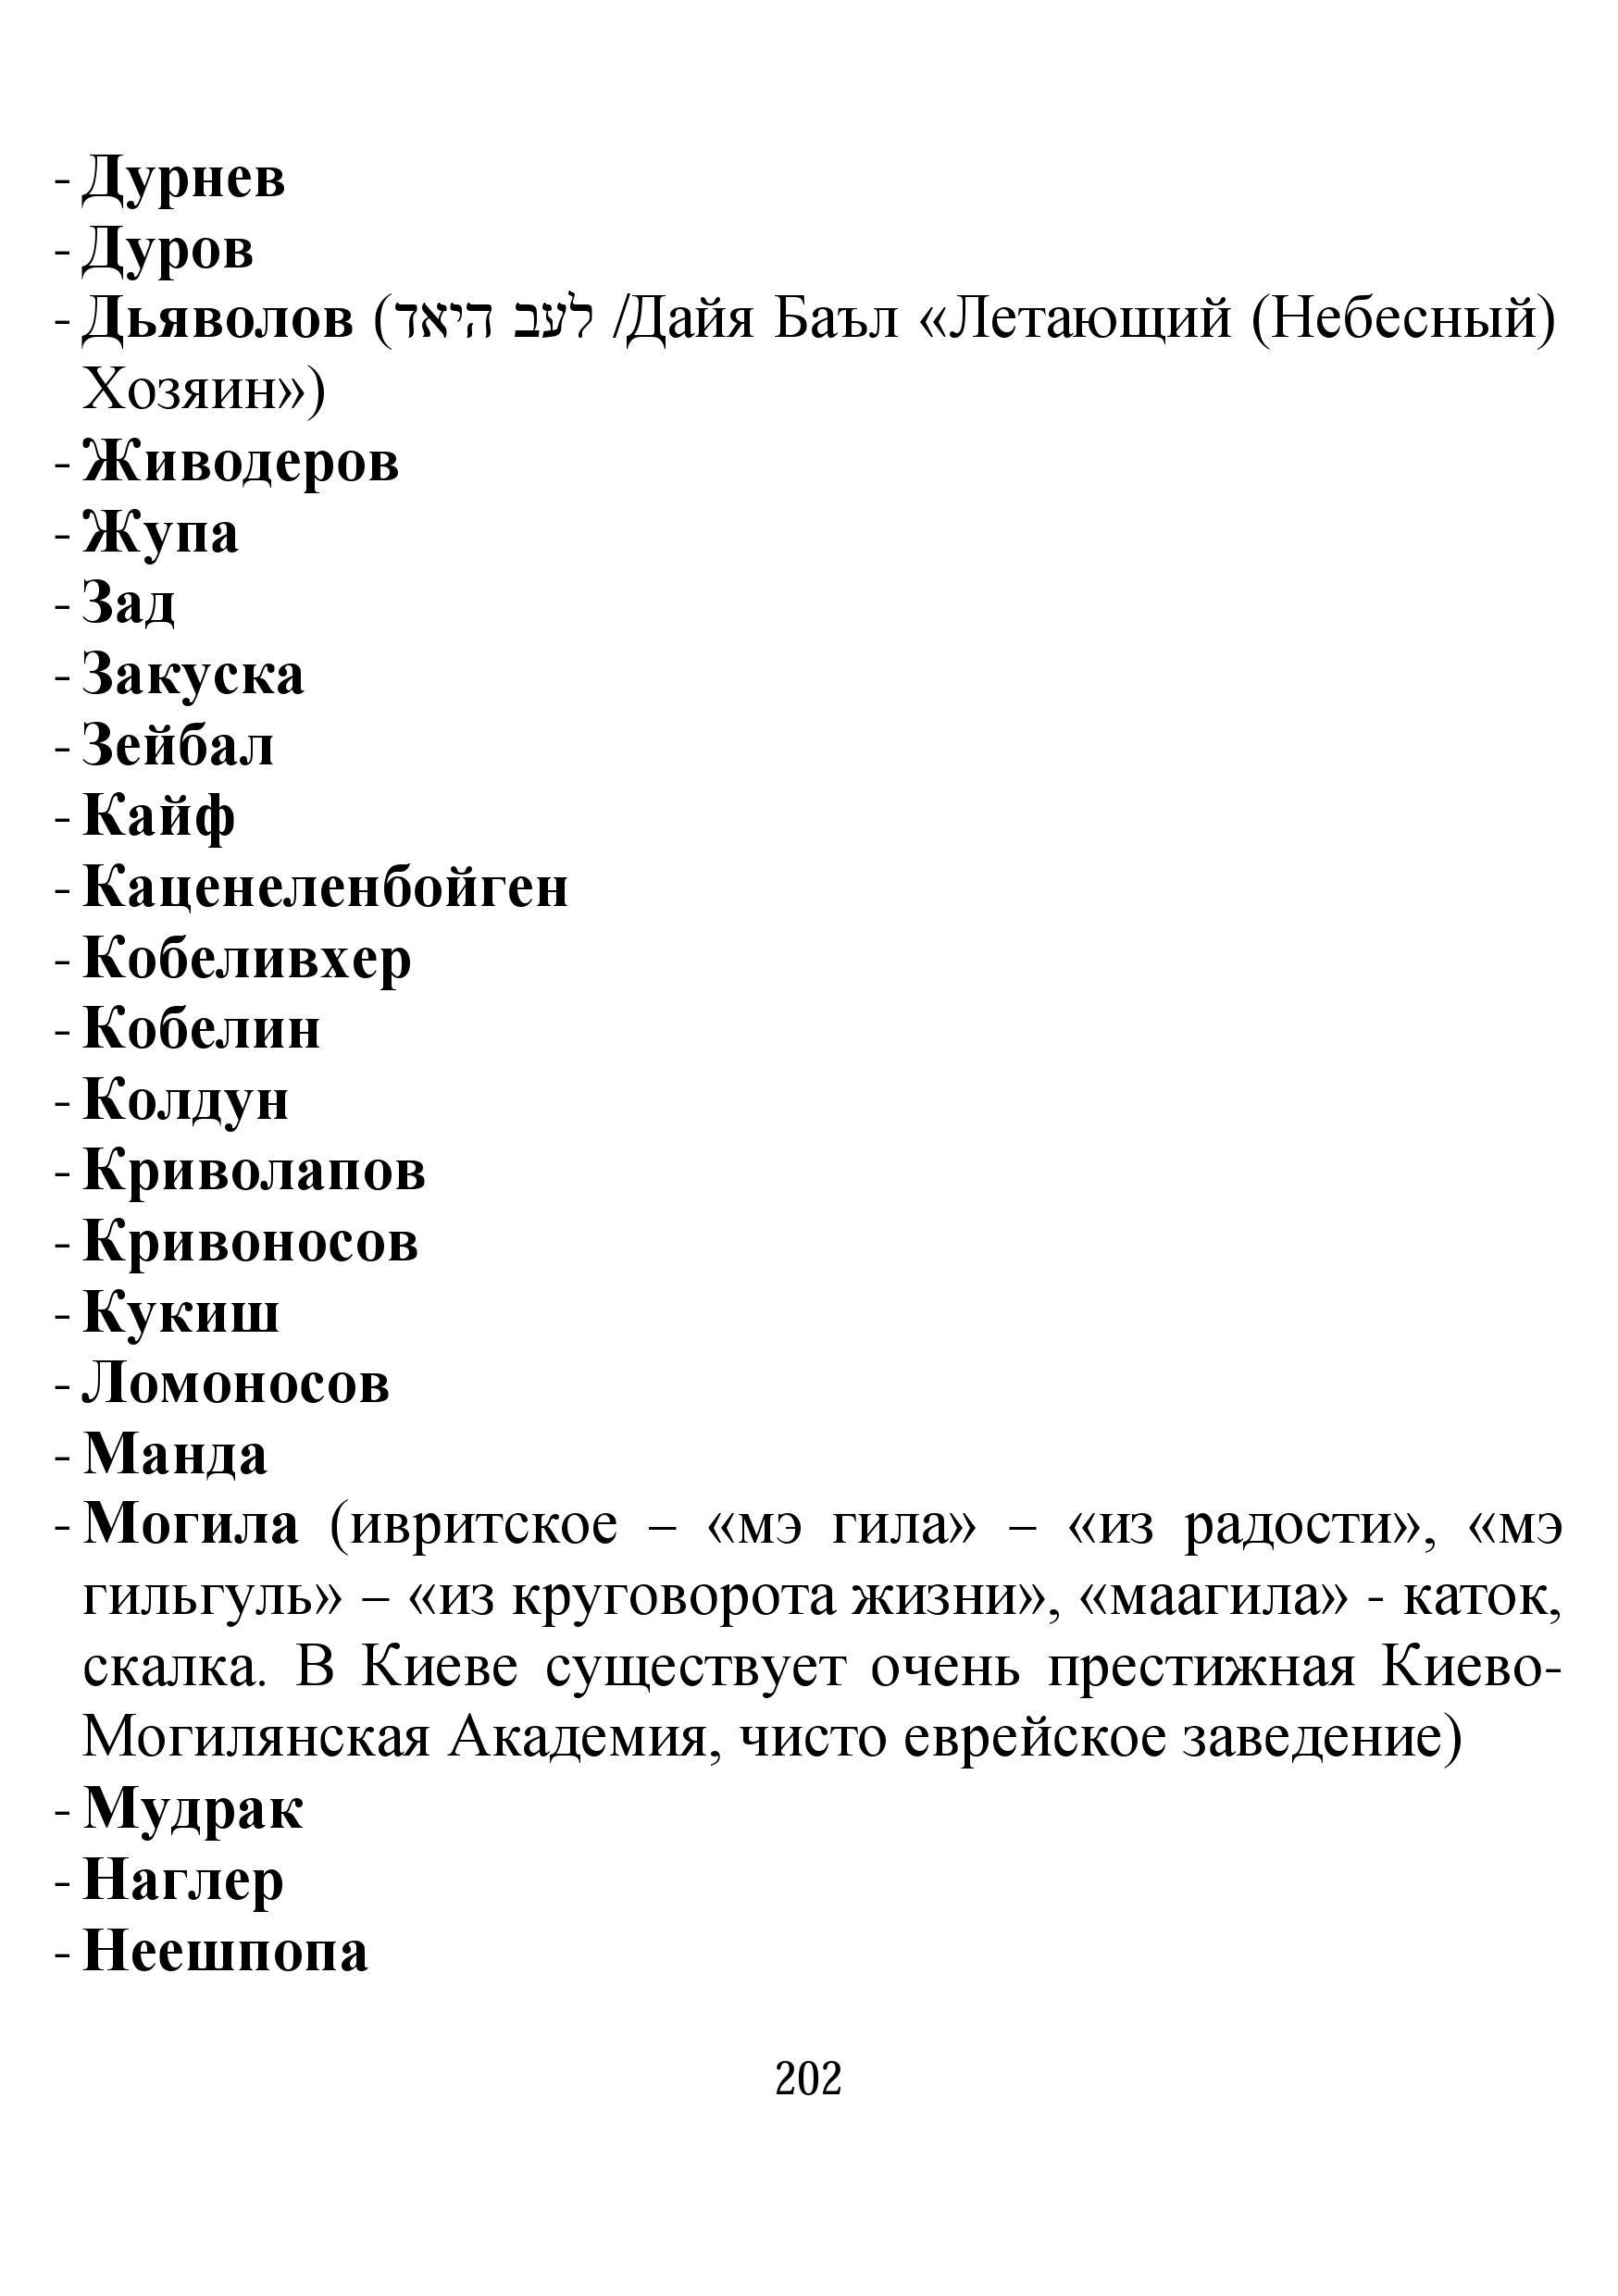 http://s5.uploads.ru/9flX2.jpg